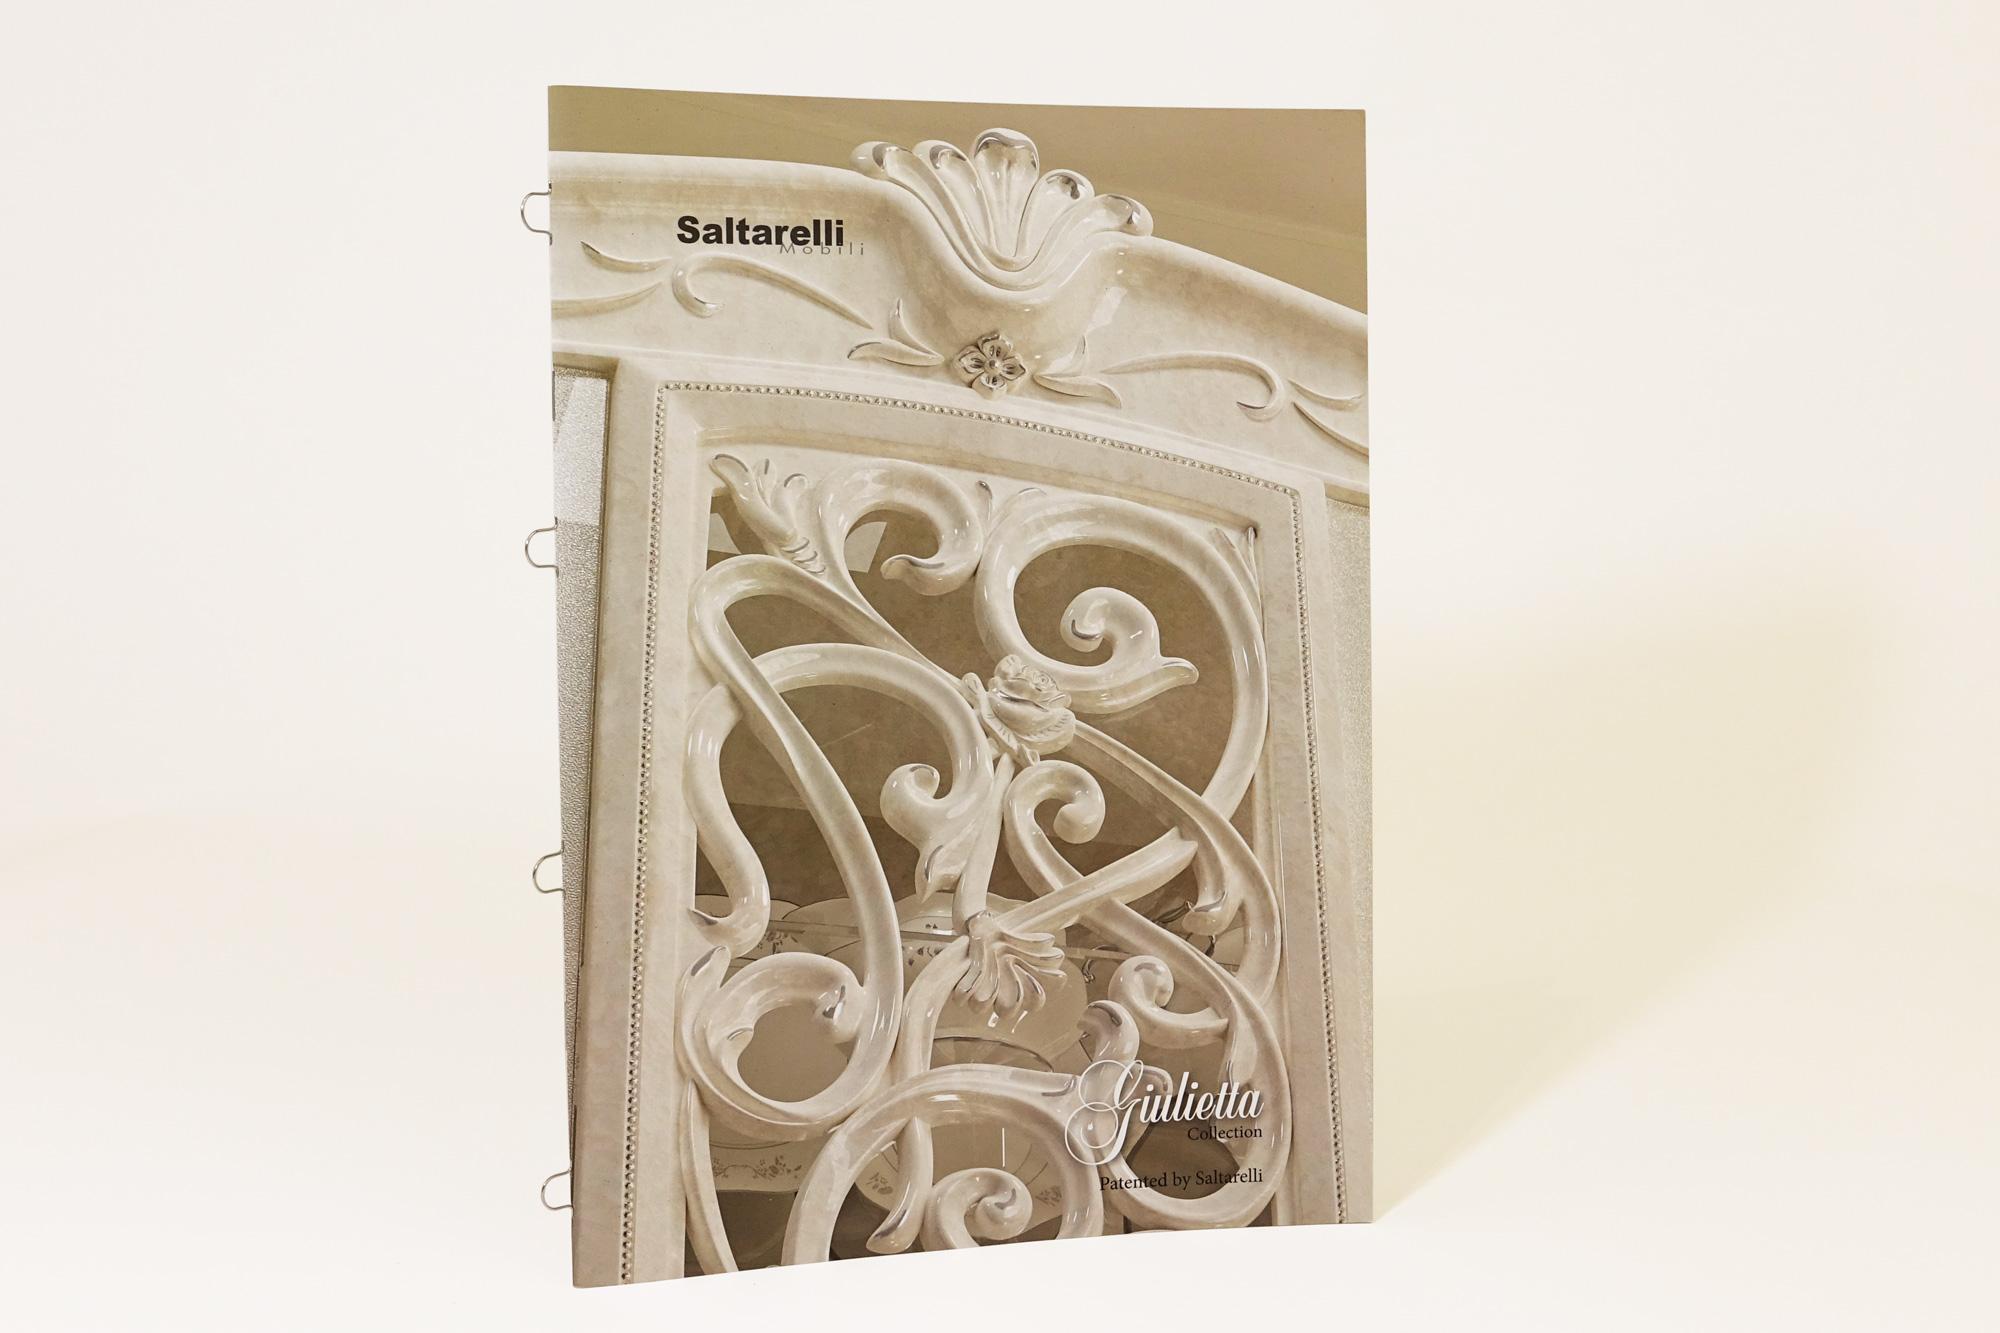 studio bartolini cataloghi grafici rendering 3D 2 Saltarelli mobili giulietta collection Sassocorvaro pesaro urbino